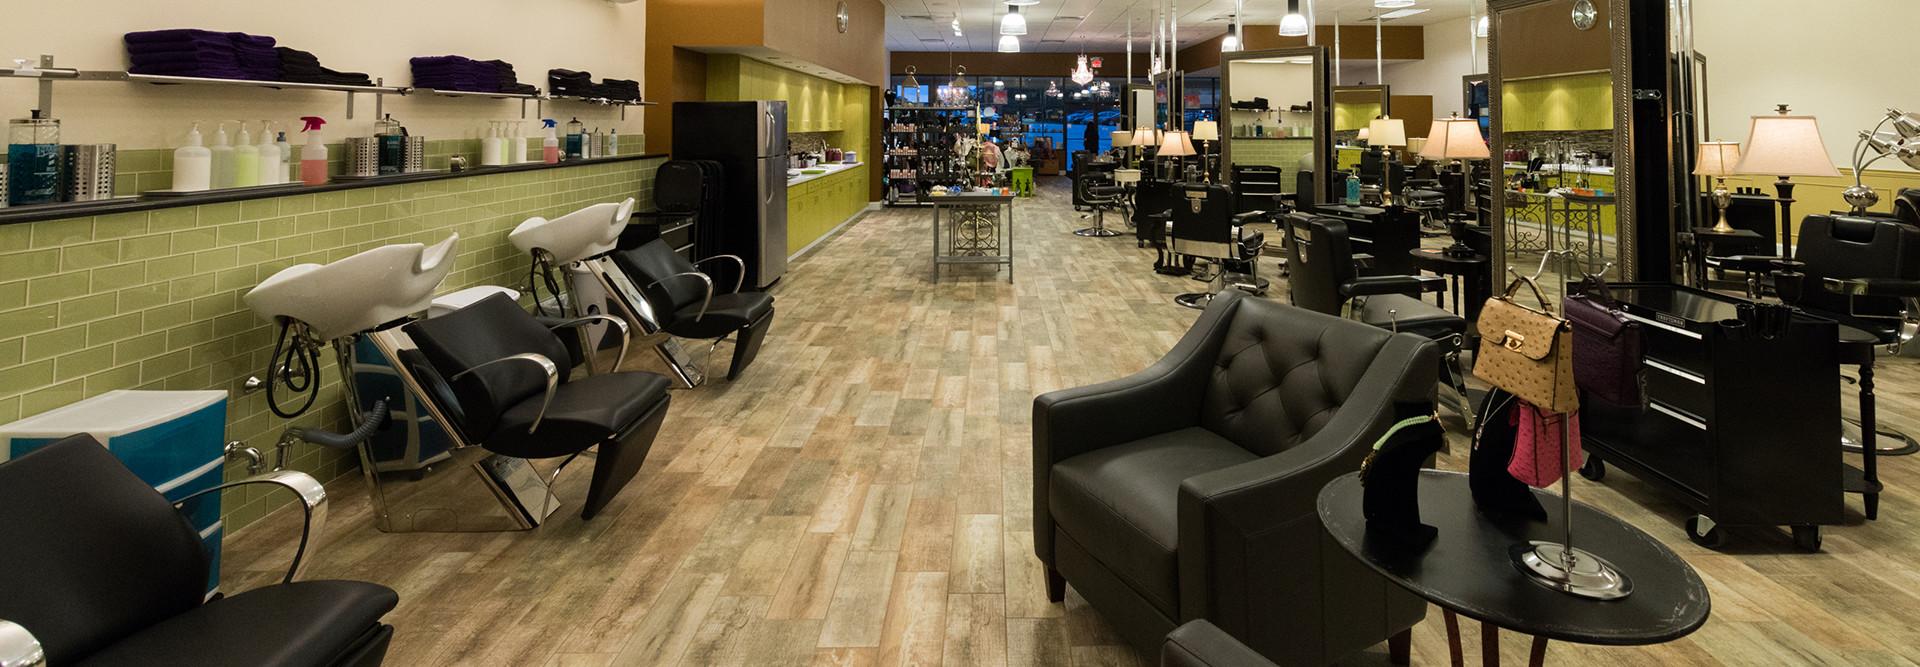 slider-style-lounge-wash-salon